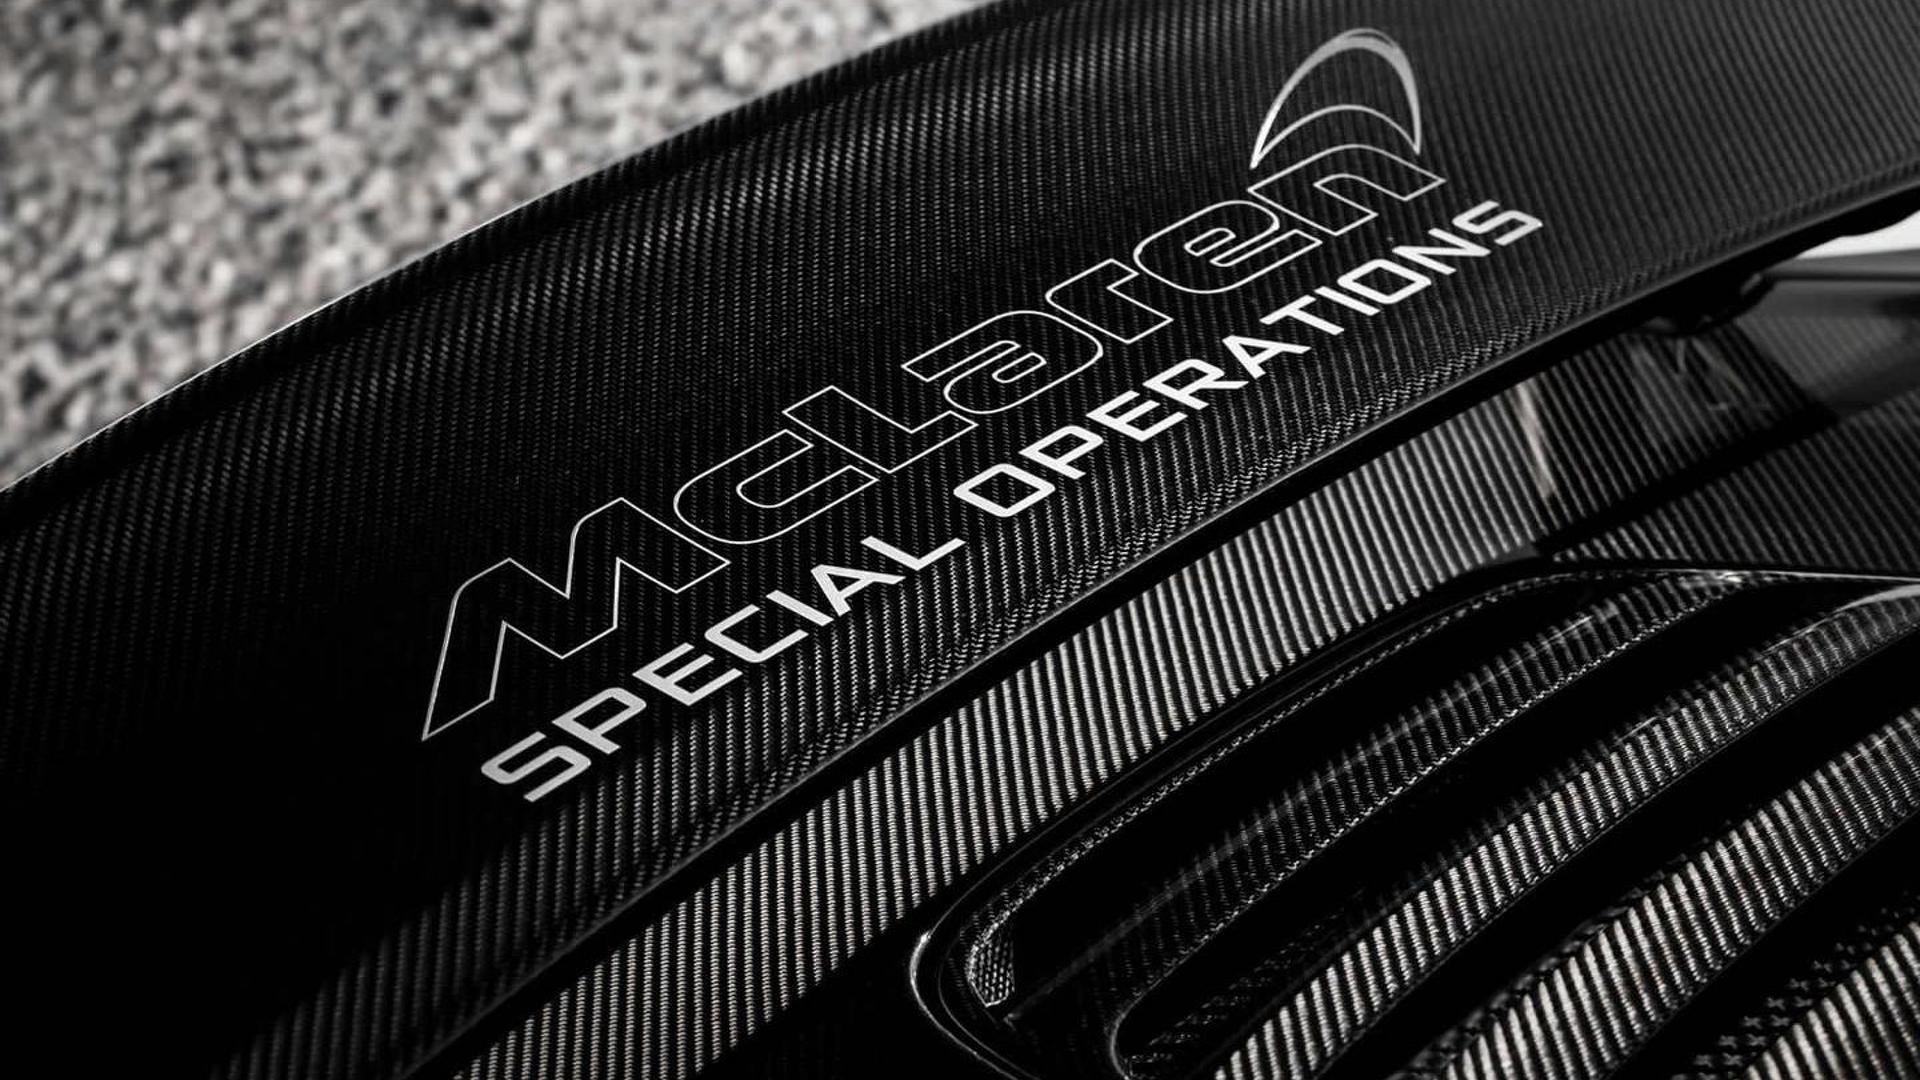 McLaren MSO 12C Concept airlifted to Hotel de Paris in Monaco [video]